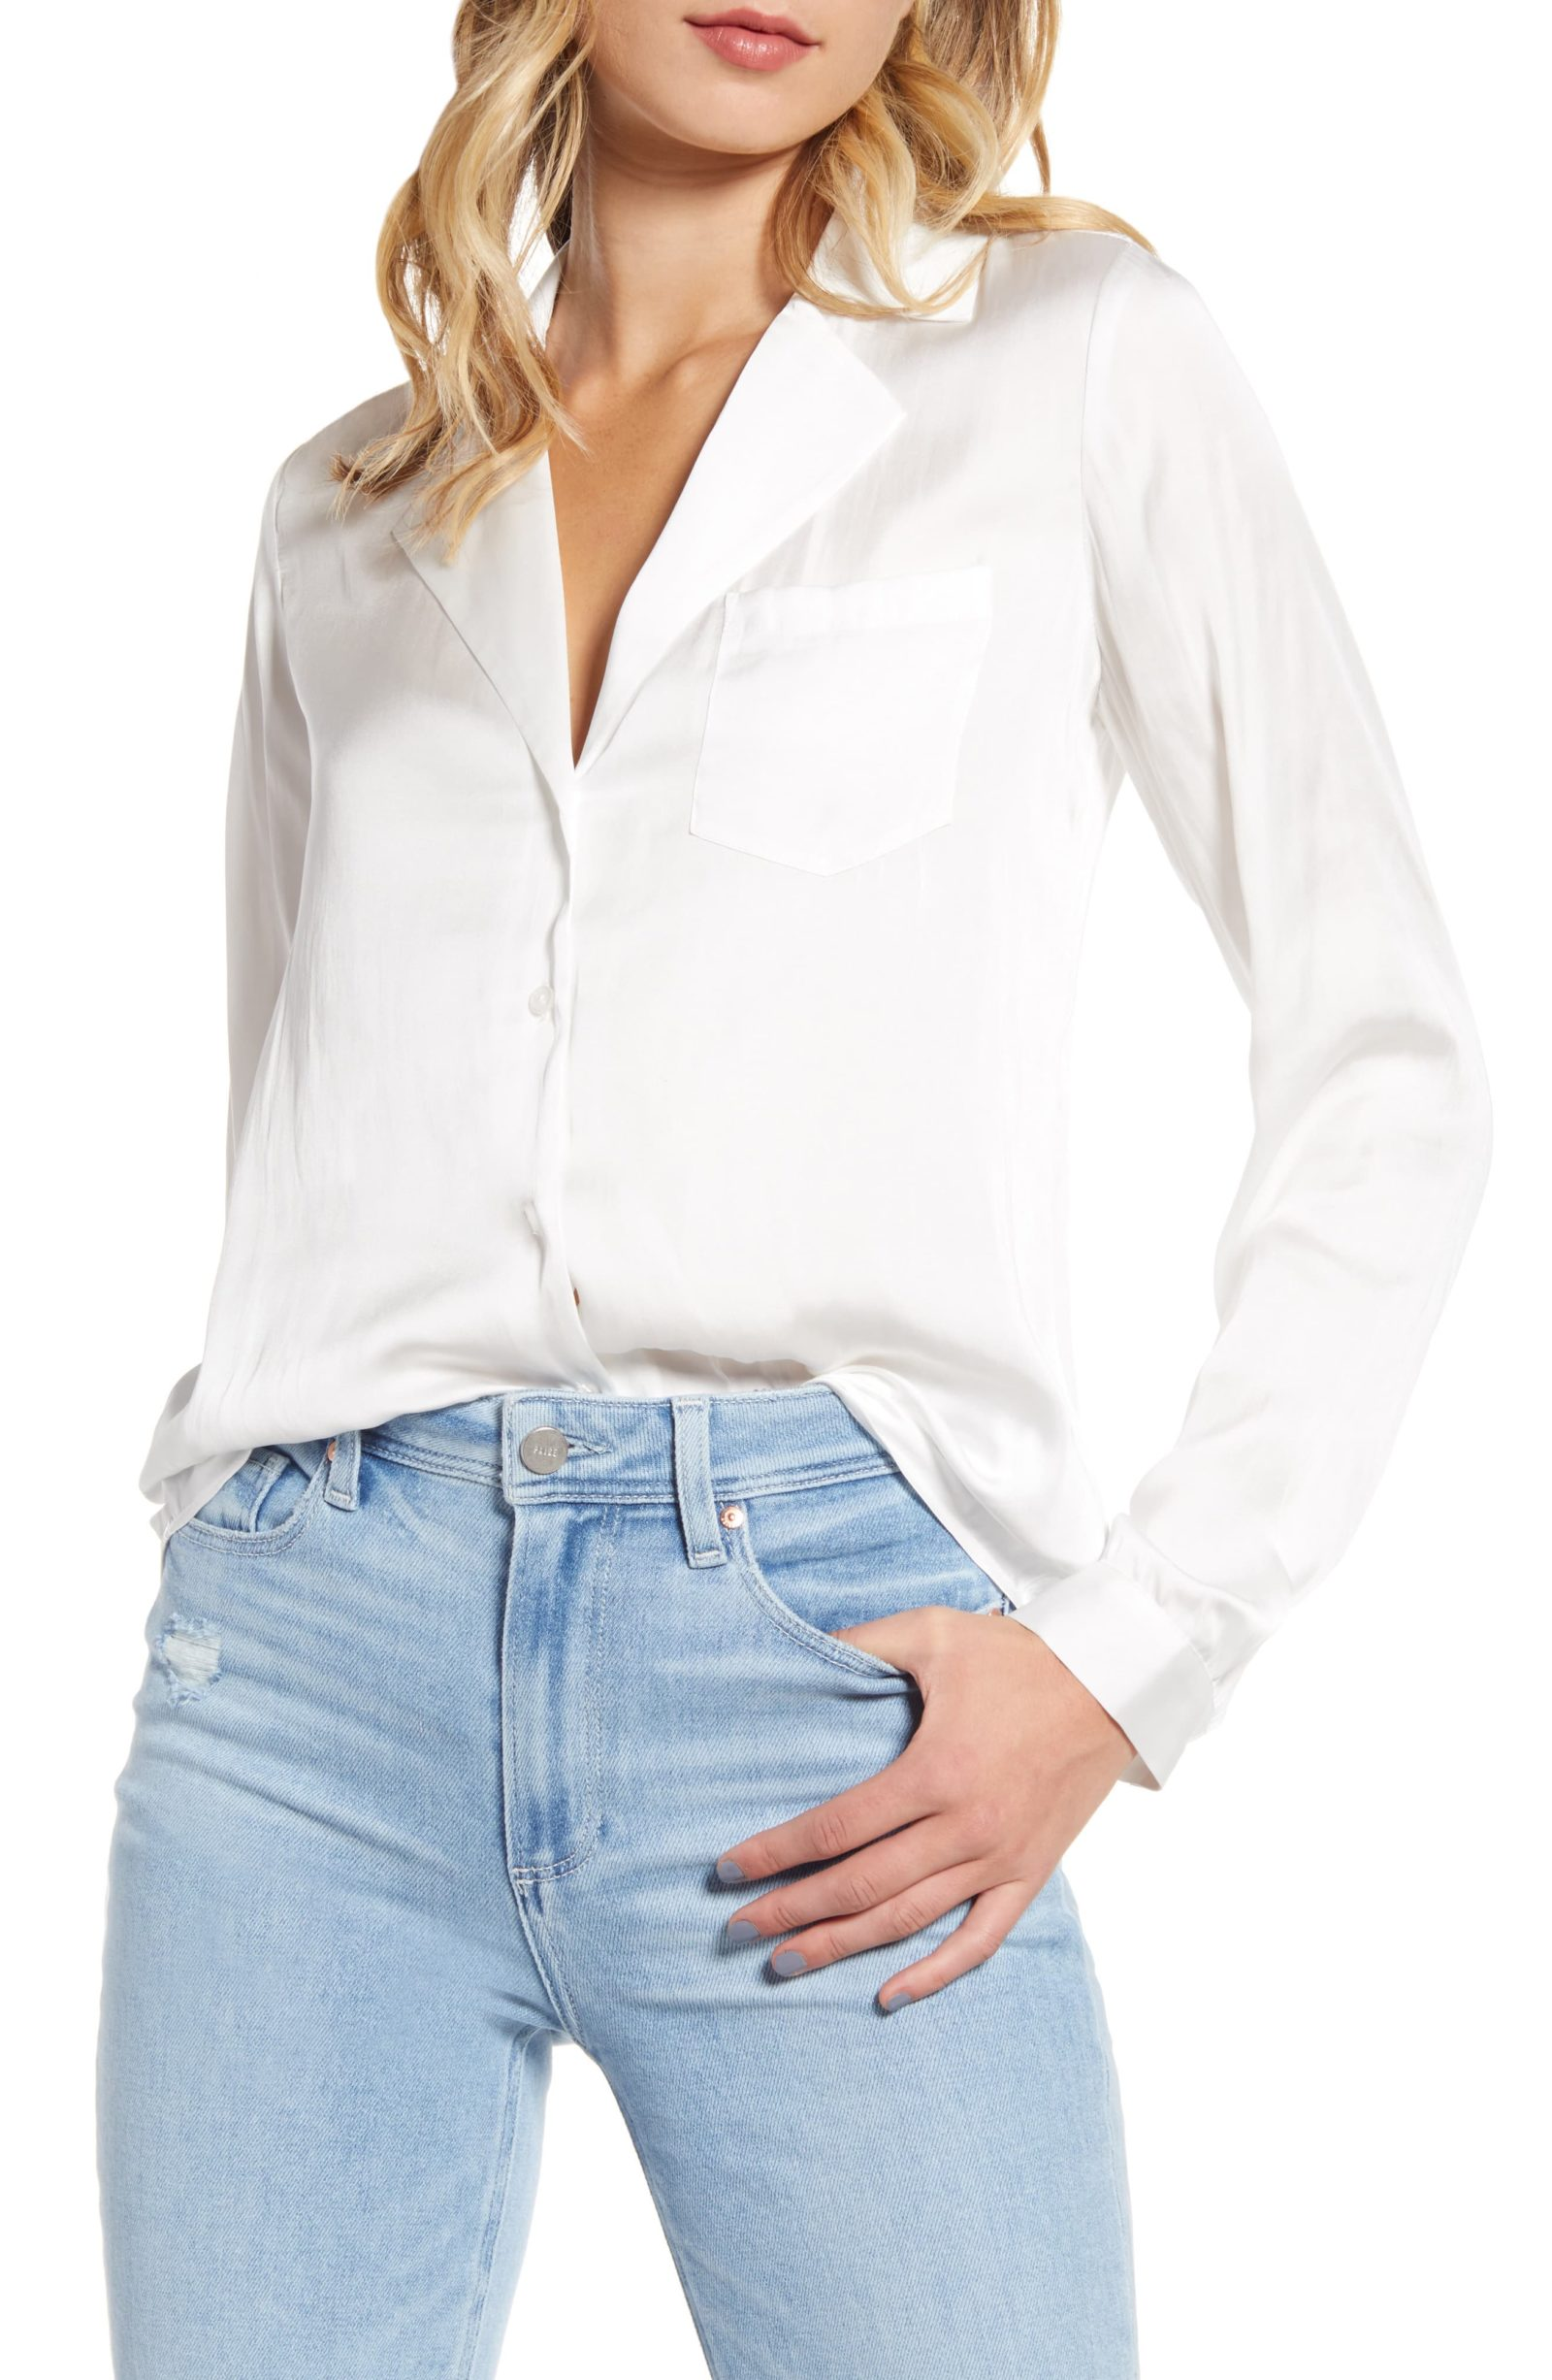 Paige Caprice Satin Shirt